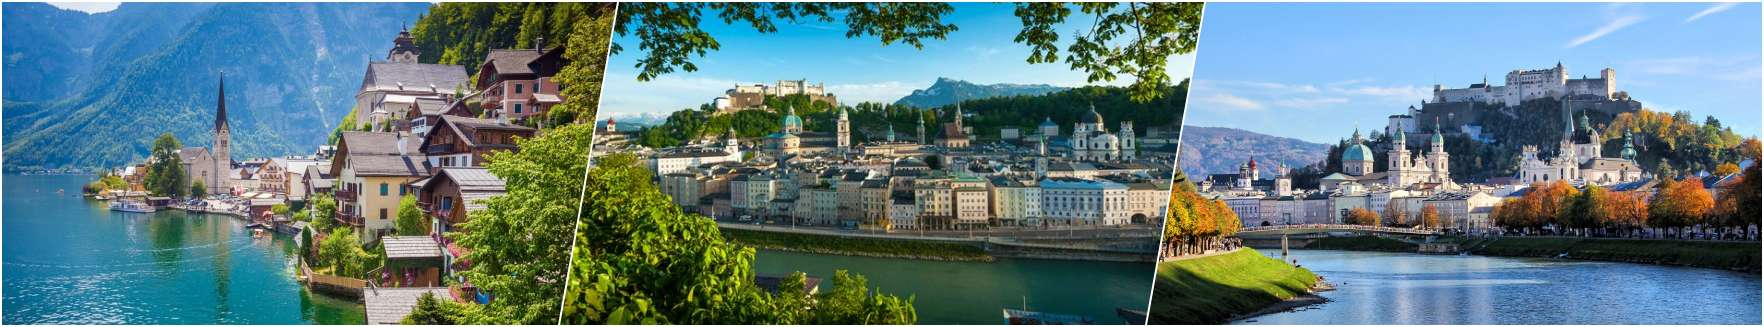 Salzkammergut - Salzburg - Hohensalzburg